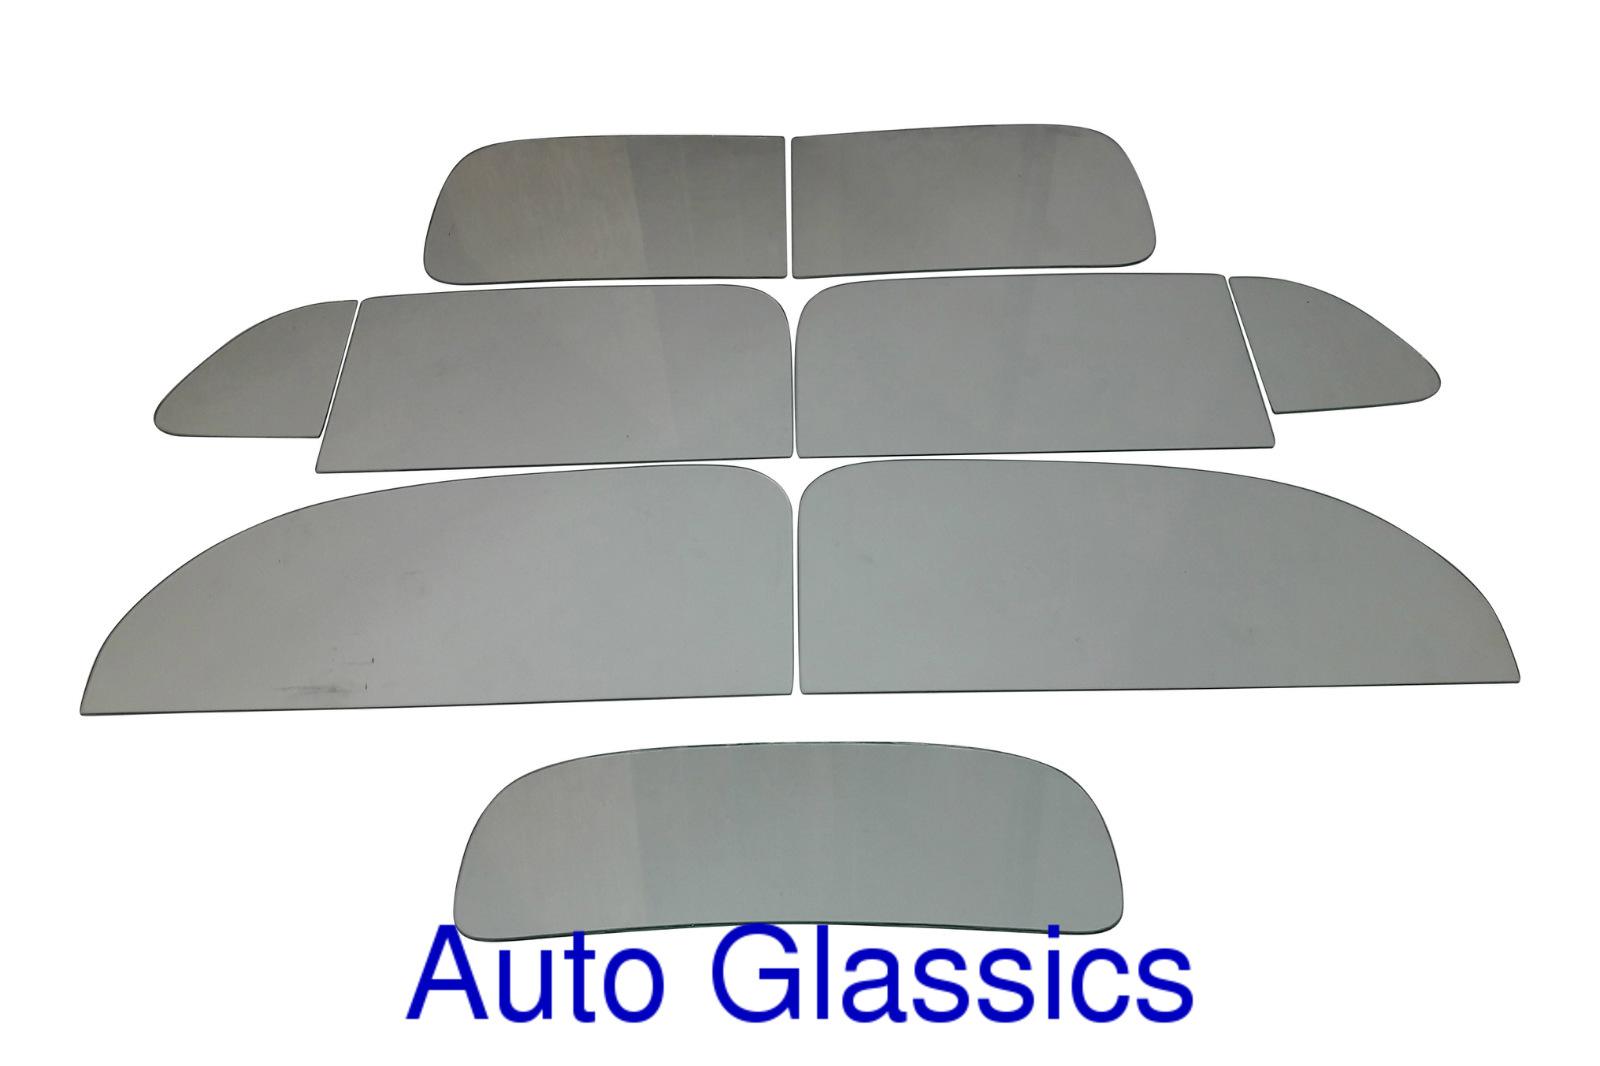 1939 Oldsmobile 2 Door Sedan Series 60 Flat Glass